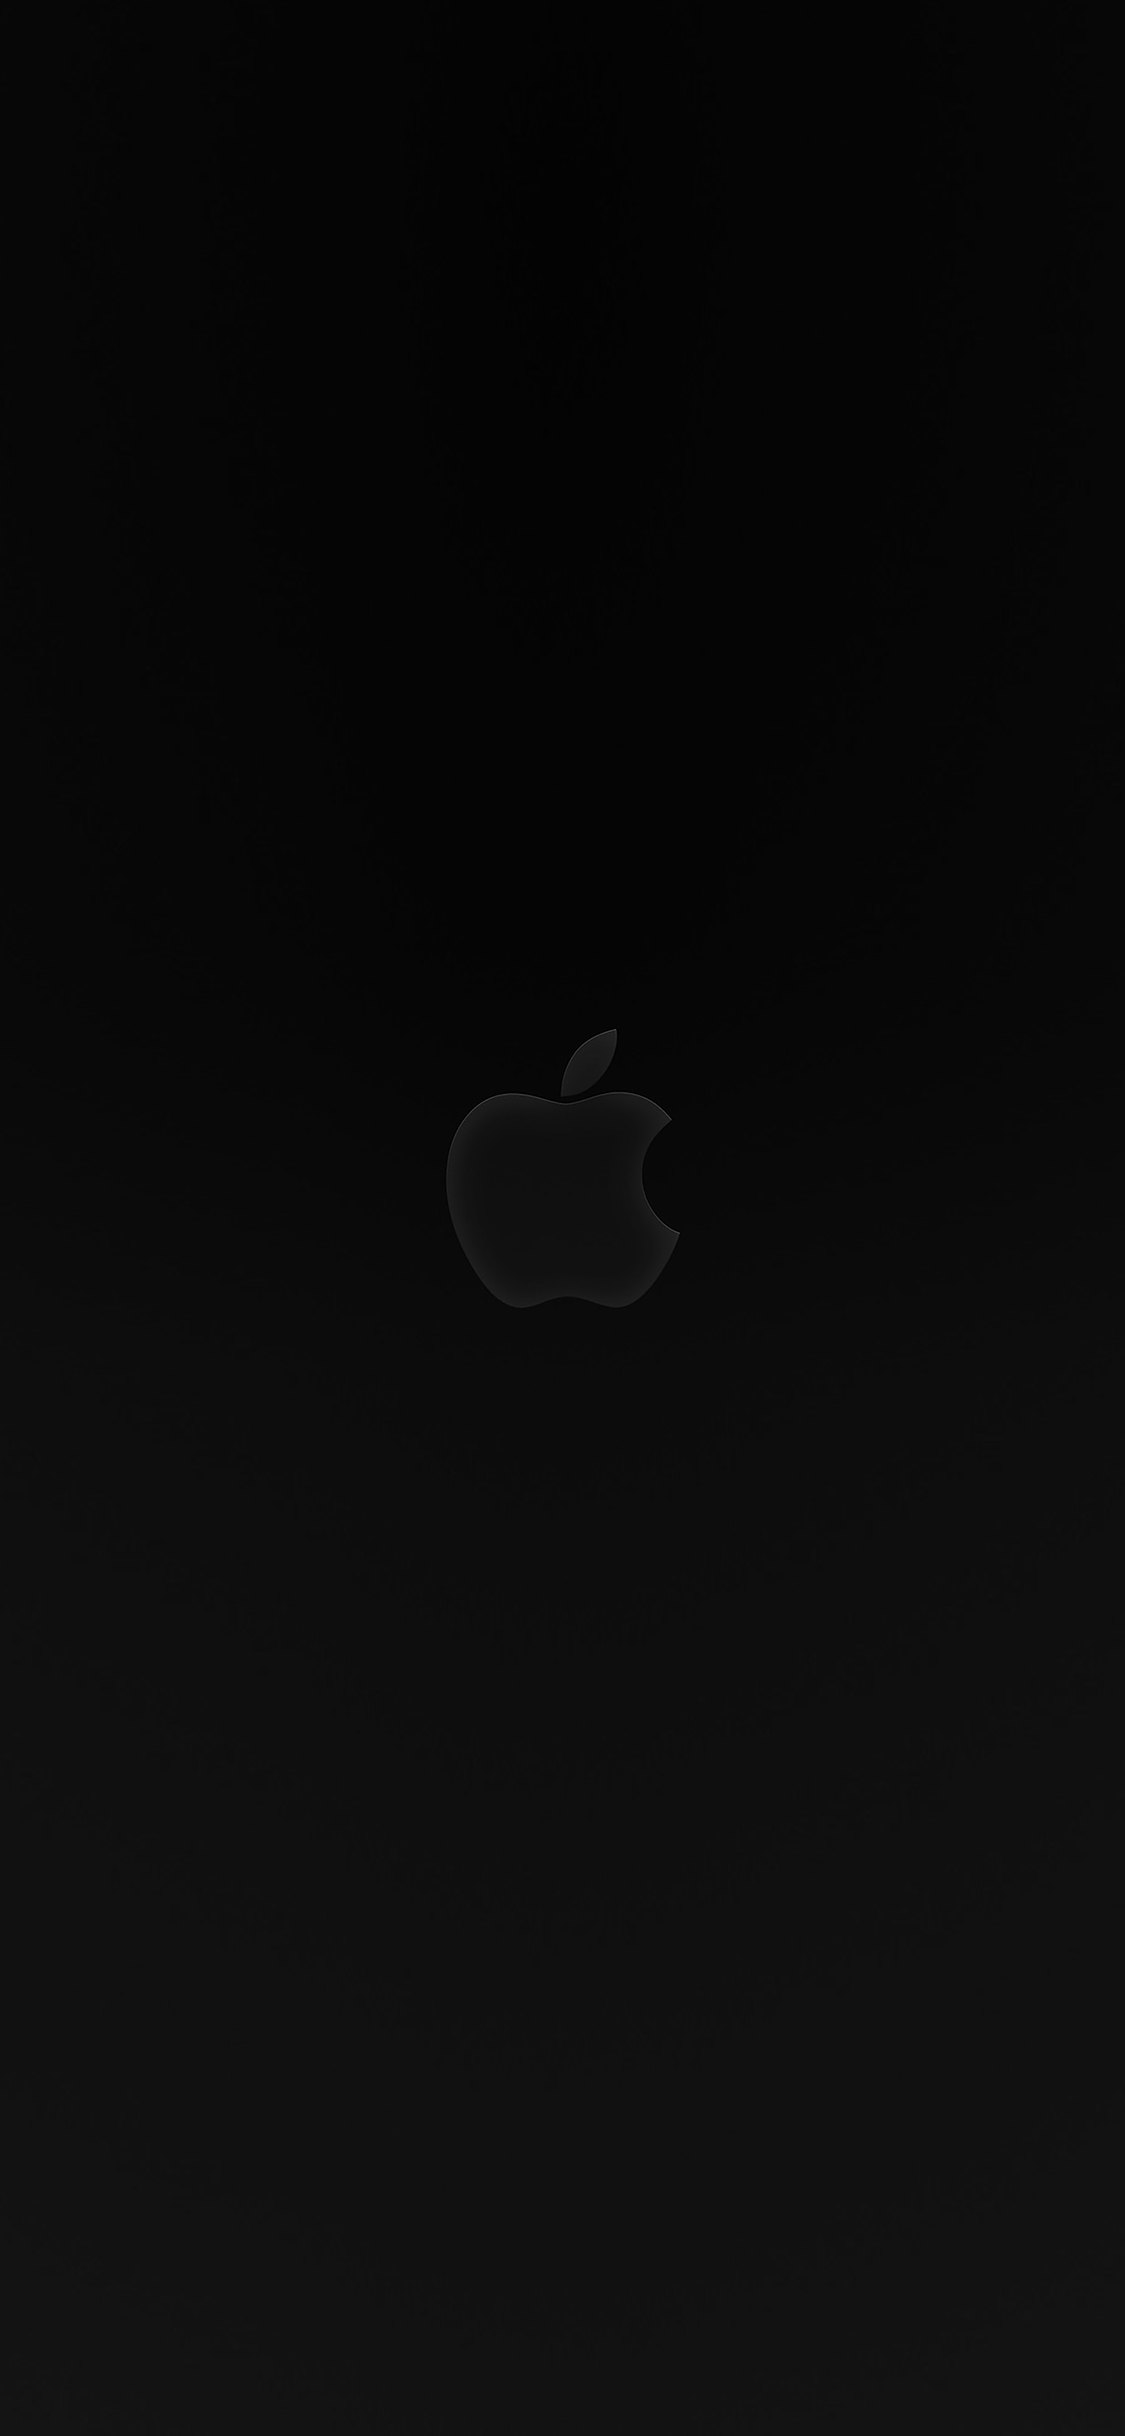 iPhoneXpapers.com-Apple-iPhone-wallpaper-ad89-apple-logo-dark-ios8-iphone6